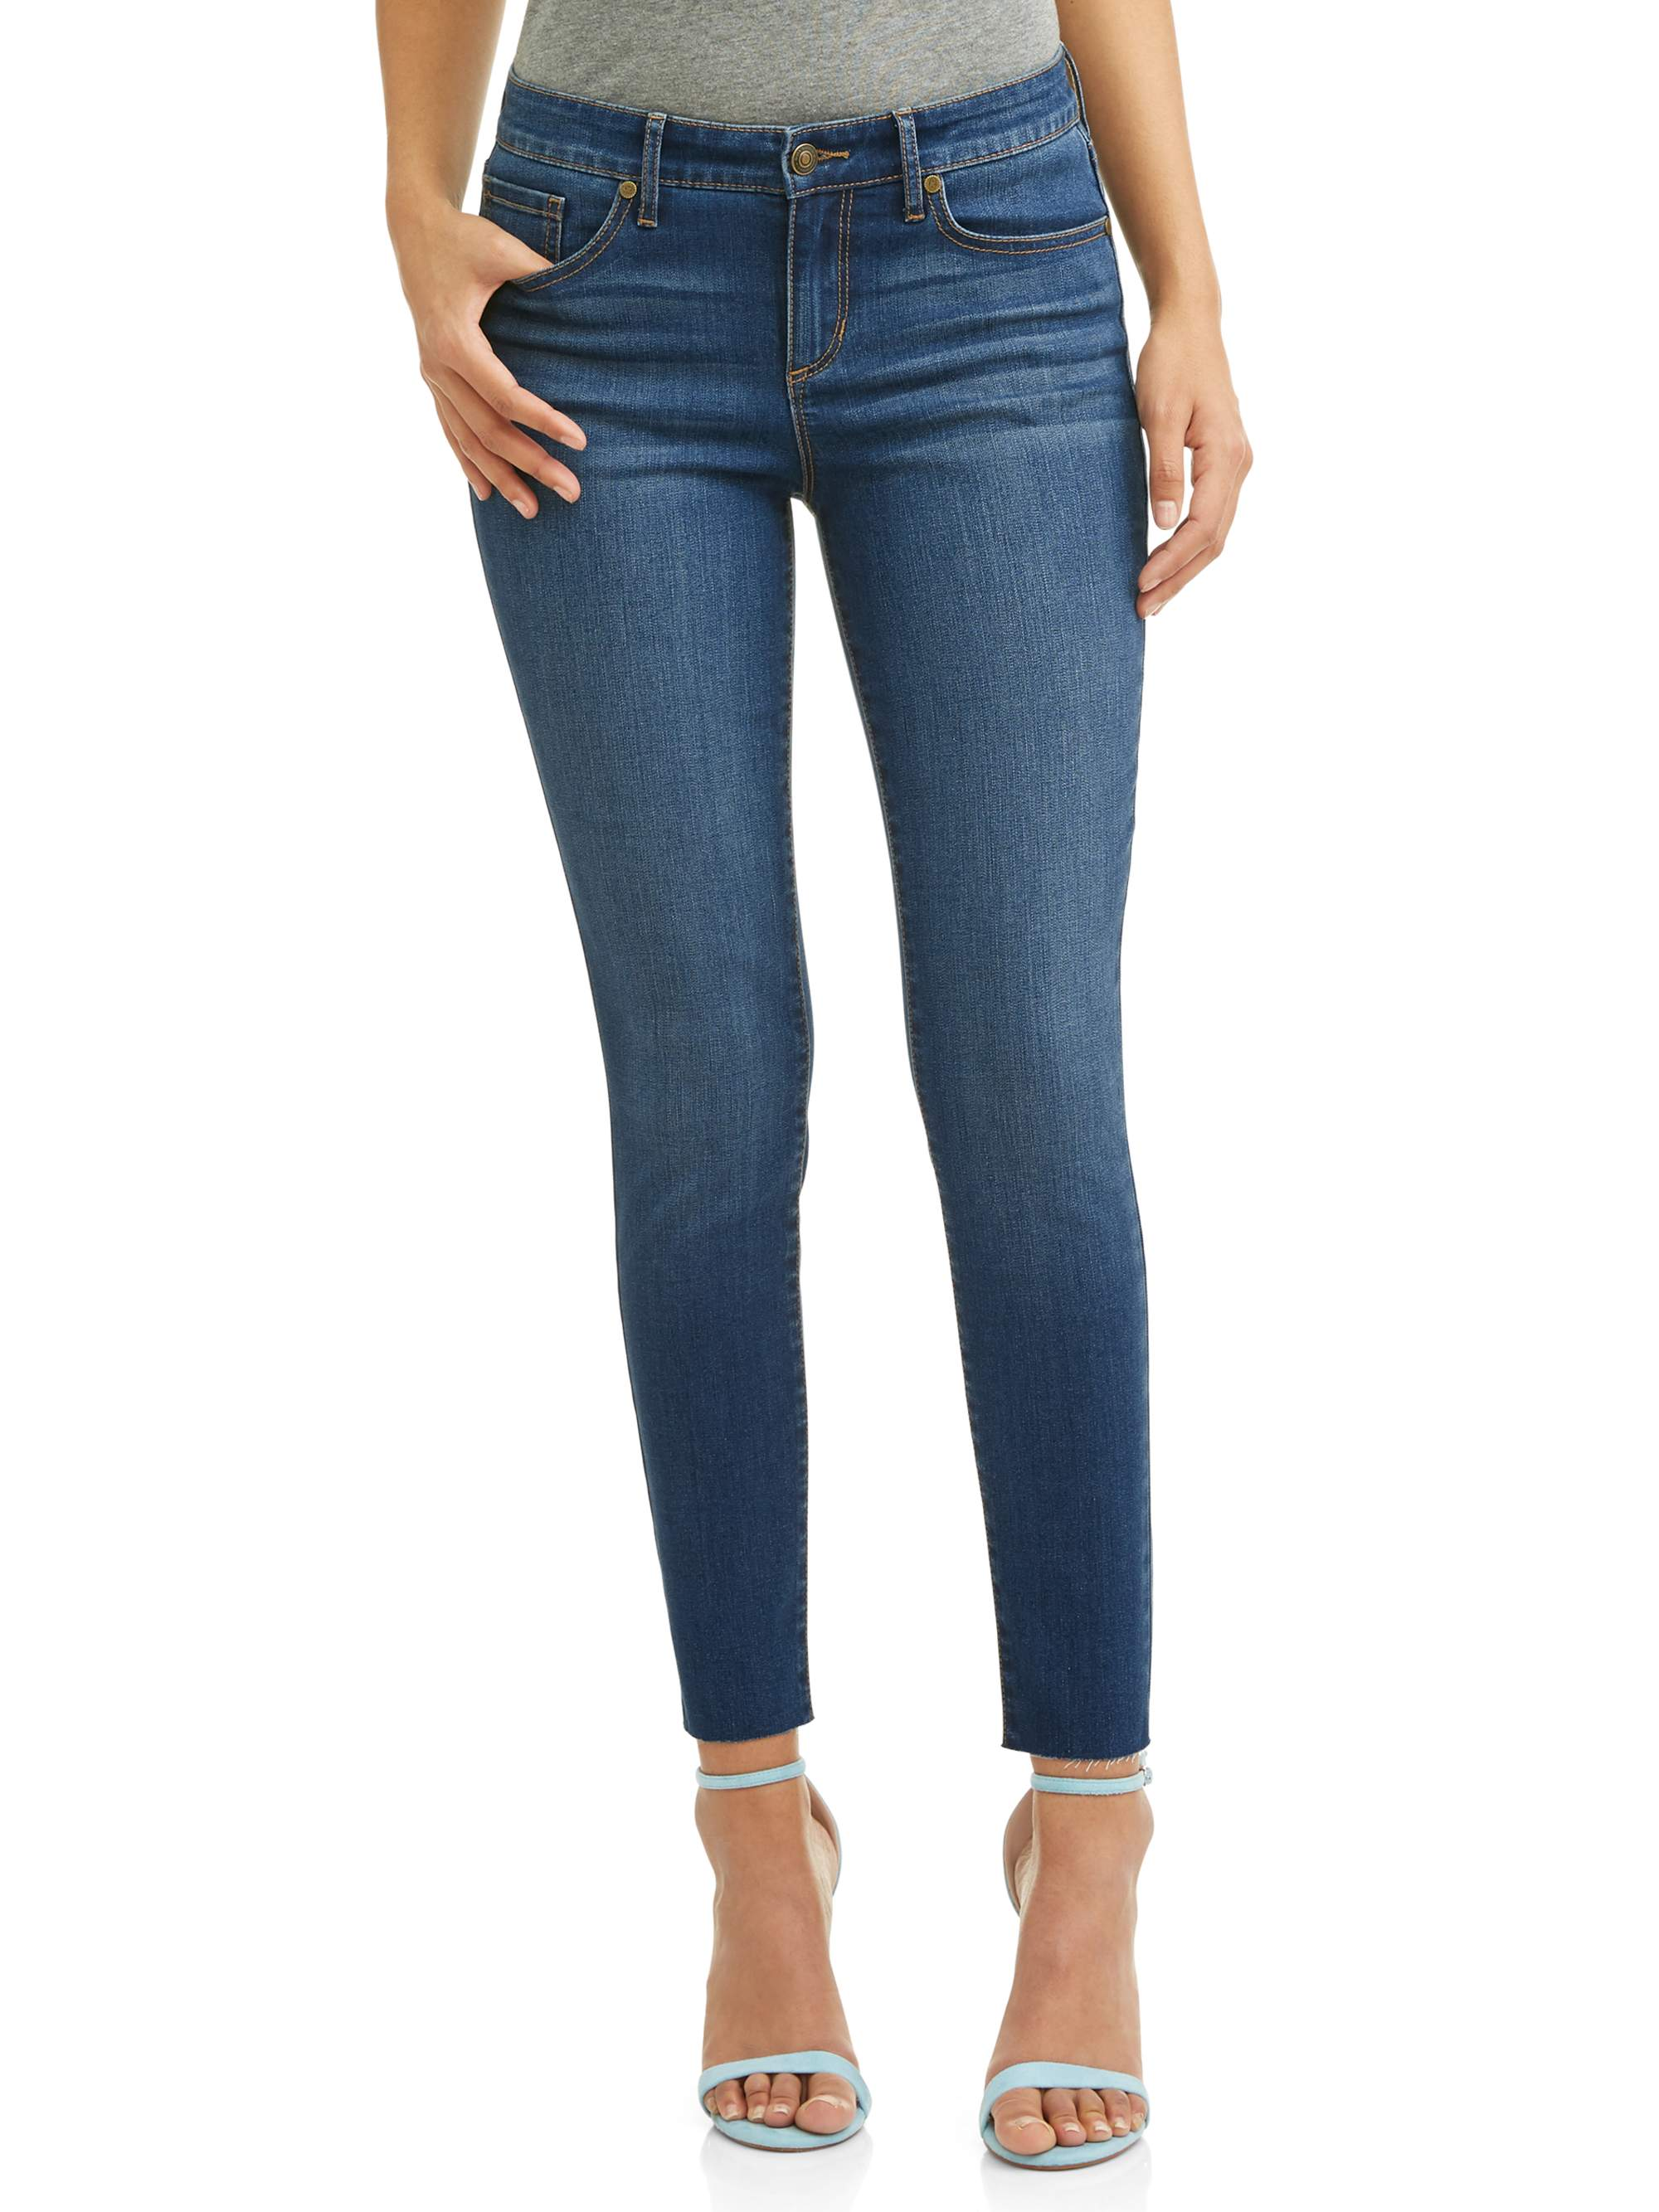 Sofia Jeans by Sofia Vergara - Sofia Jeans by Sofia Vergara Sofia Skinny Mid Rise Soft Stretch Ankle Jean Women's - Walmart.com